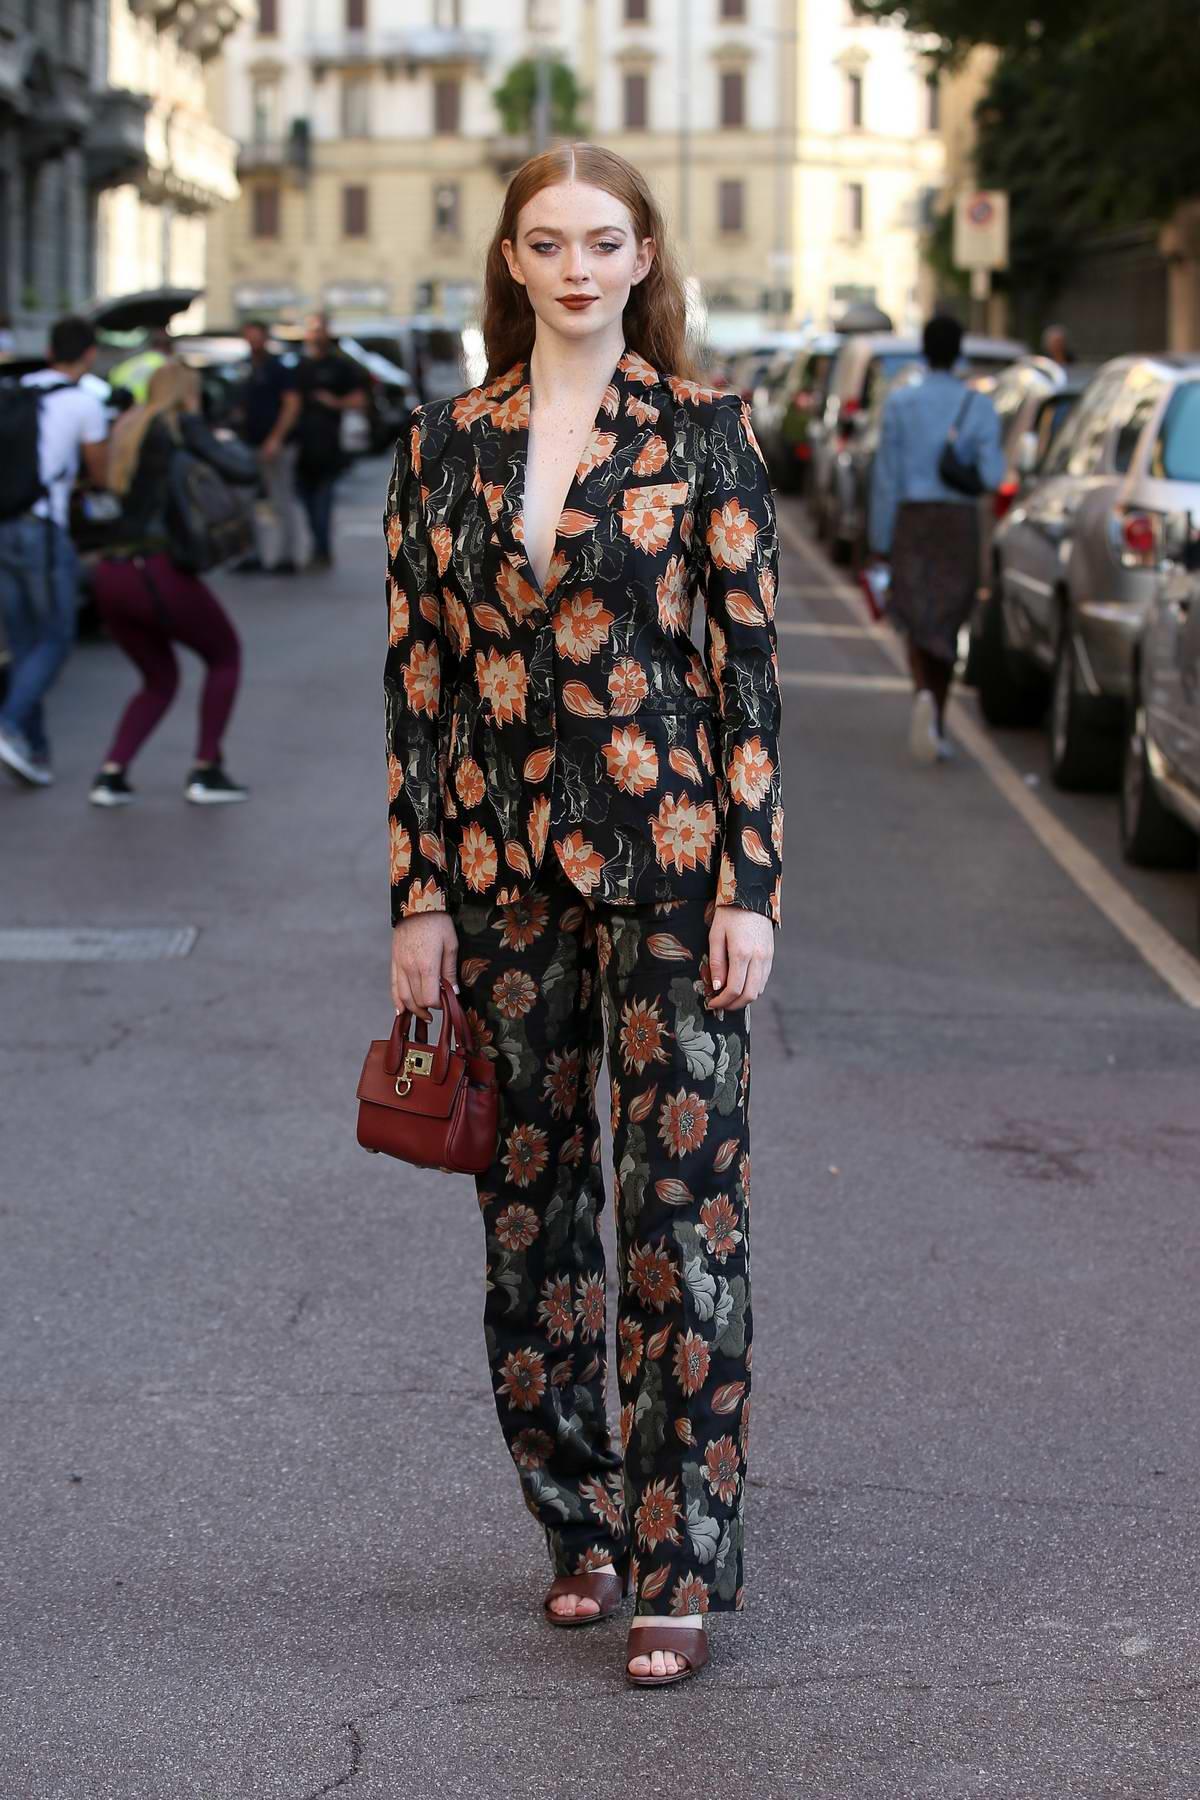 Larsen Thompson attends Salvatore Ferragamo show during Milan Fashion Week, Spring/Summer 2020 in Milan, Italy